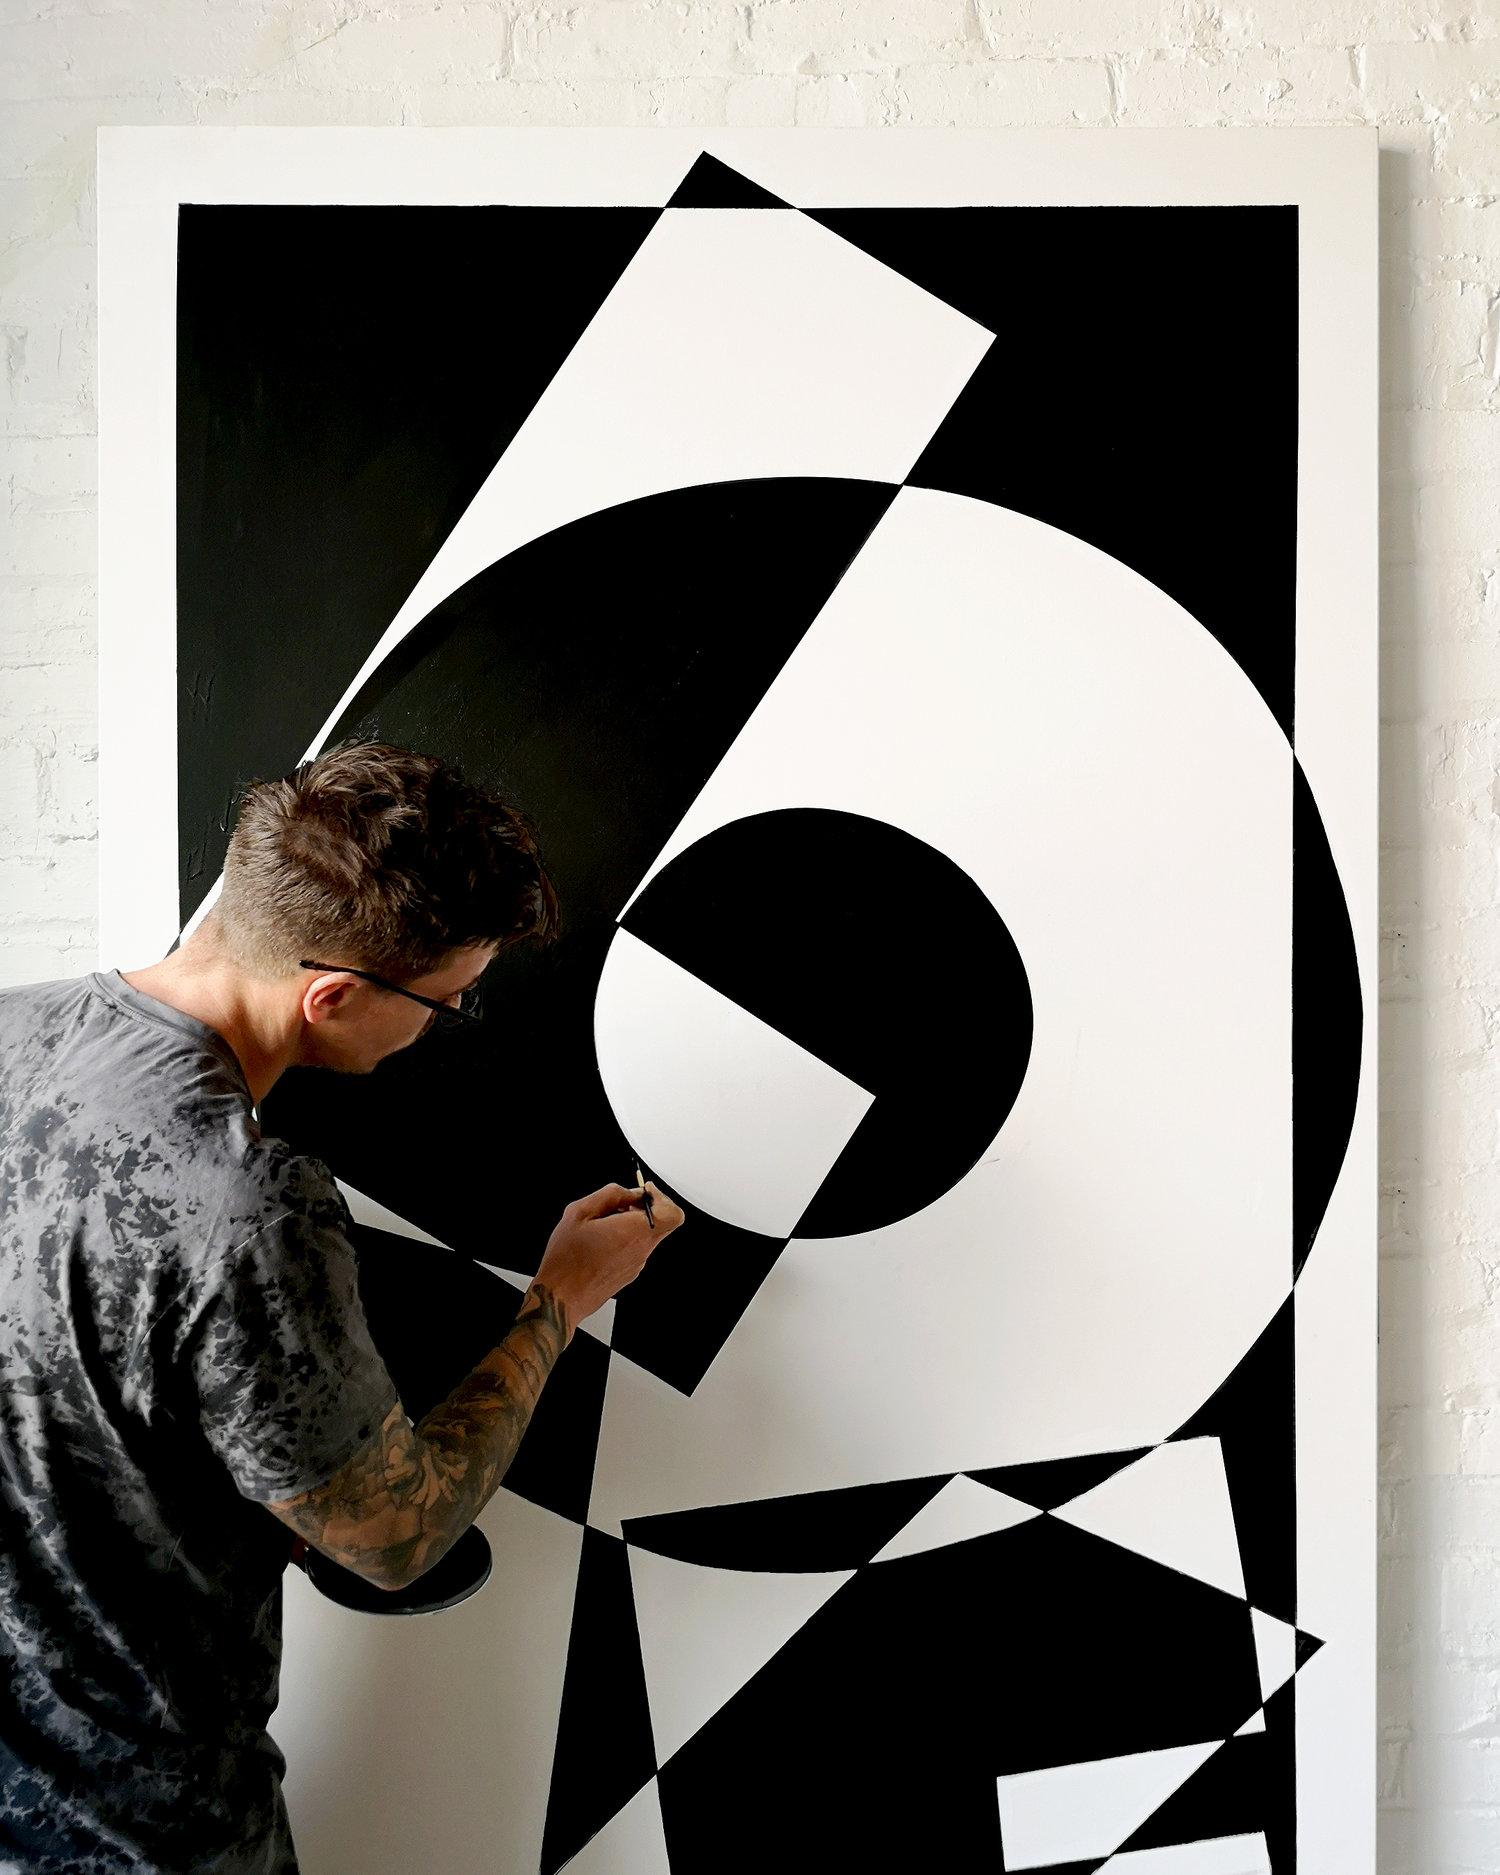 Image of Ben Johnston creating Love mural